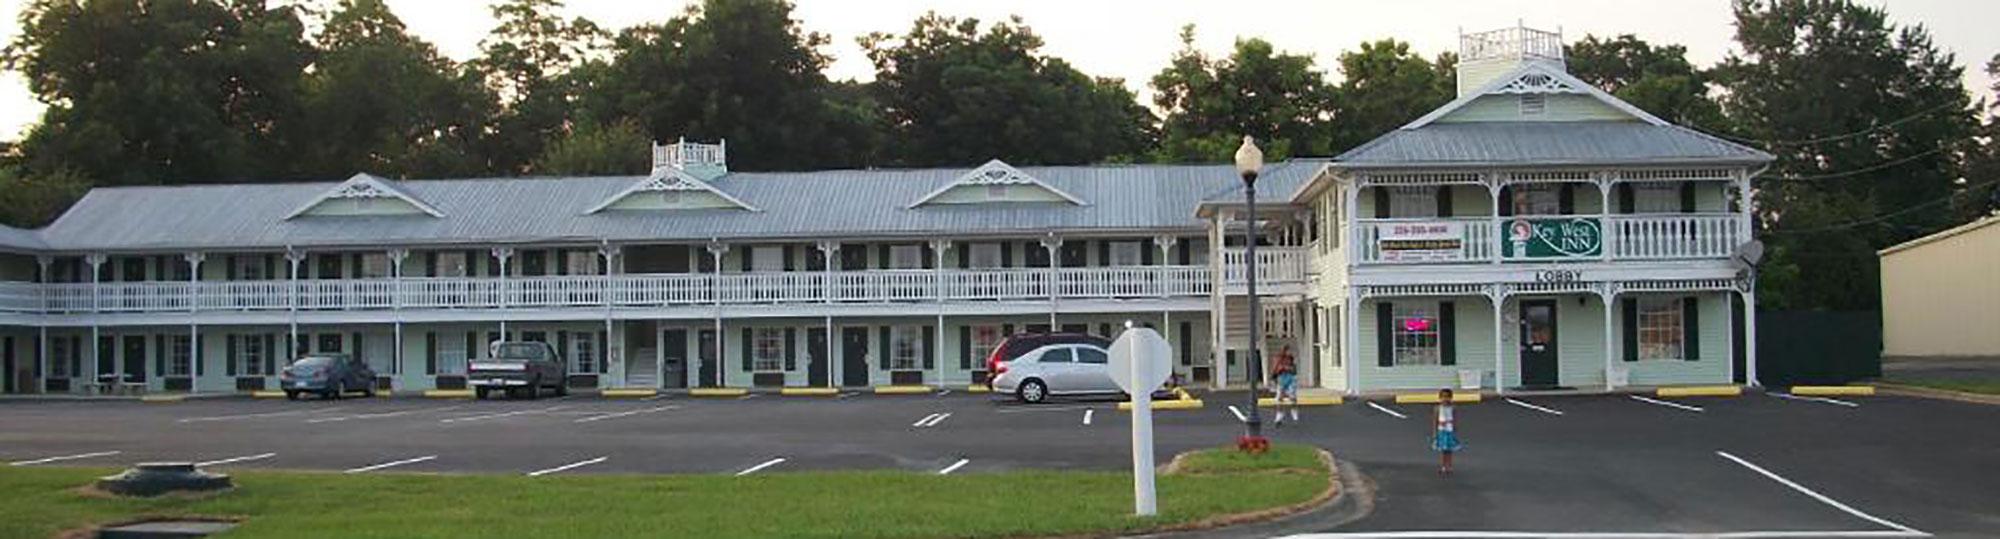 Key West Inn Hotels and Resorts Boaz